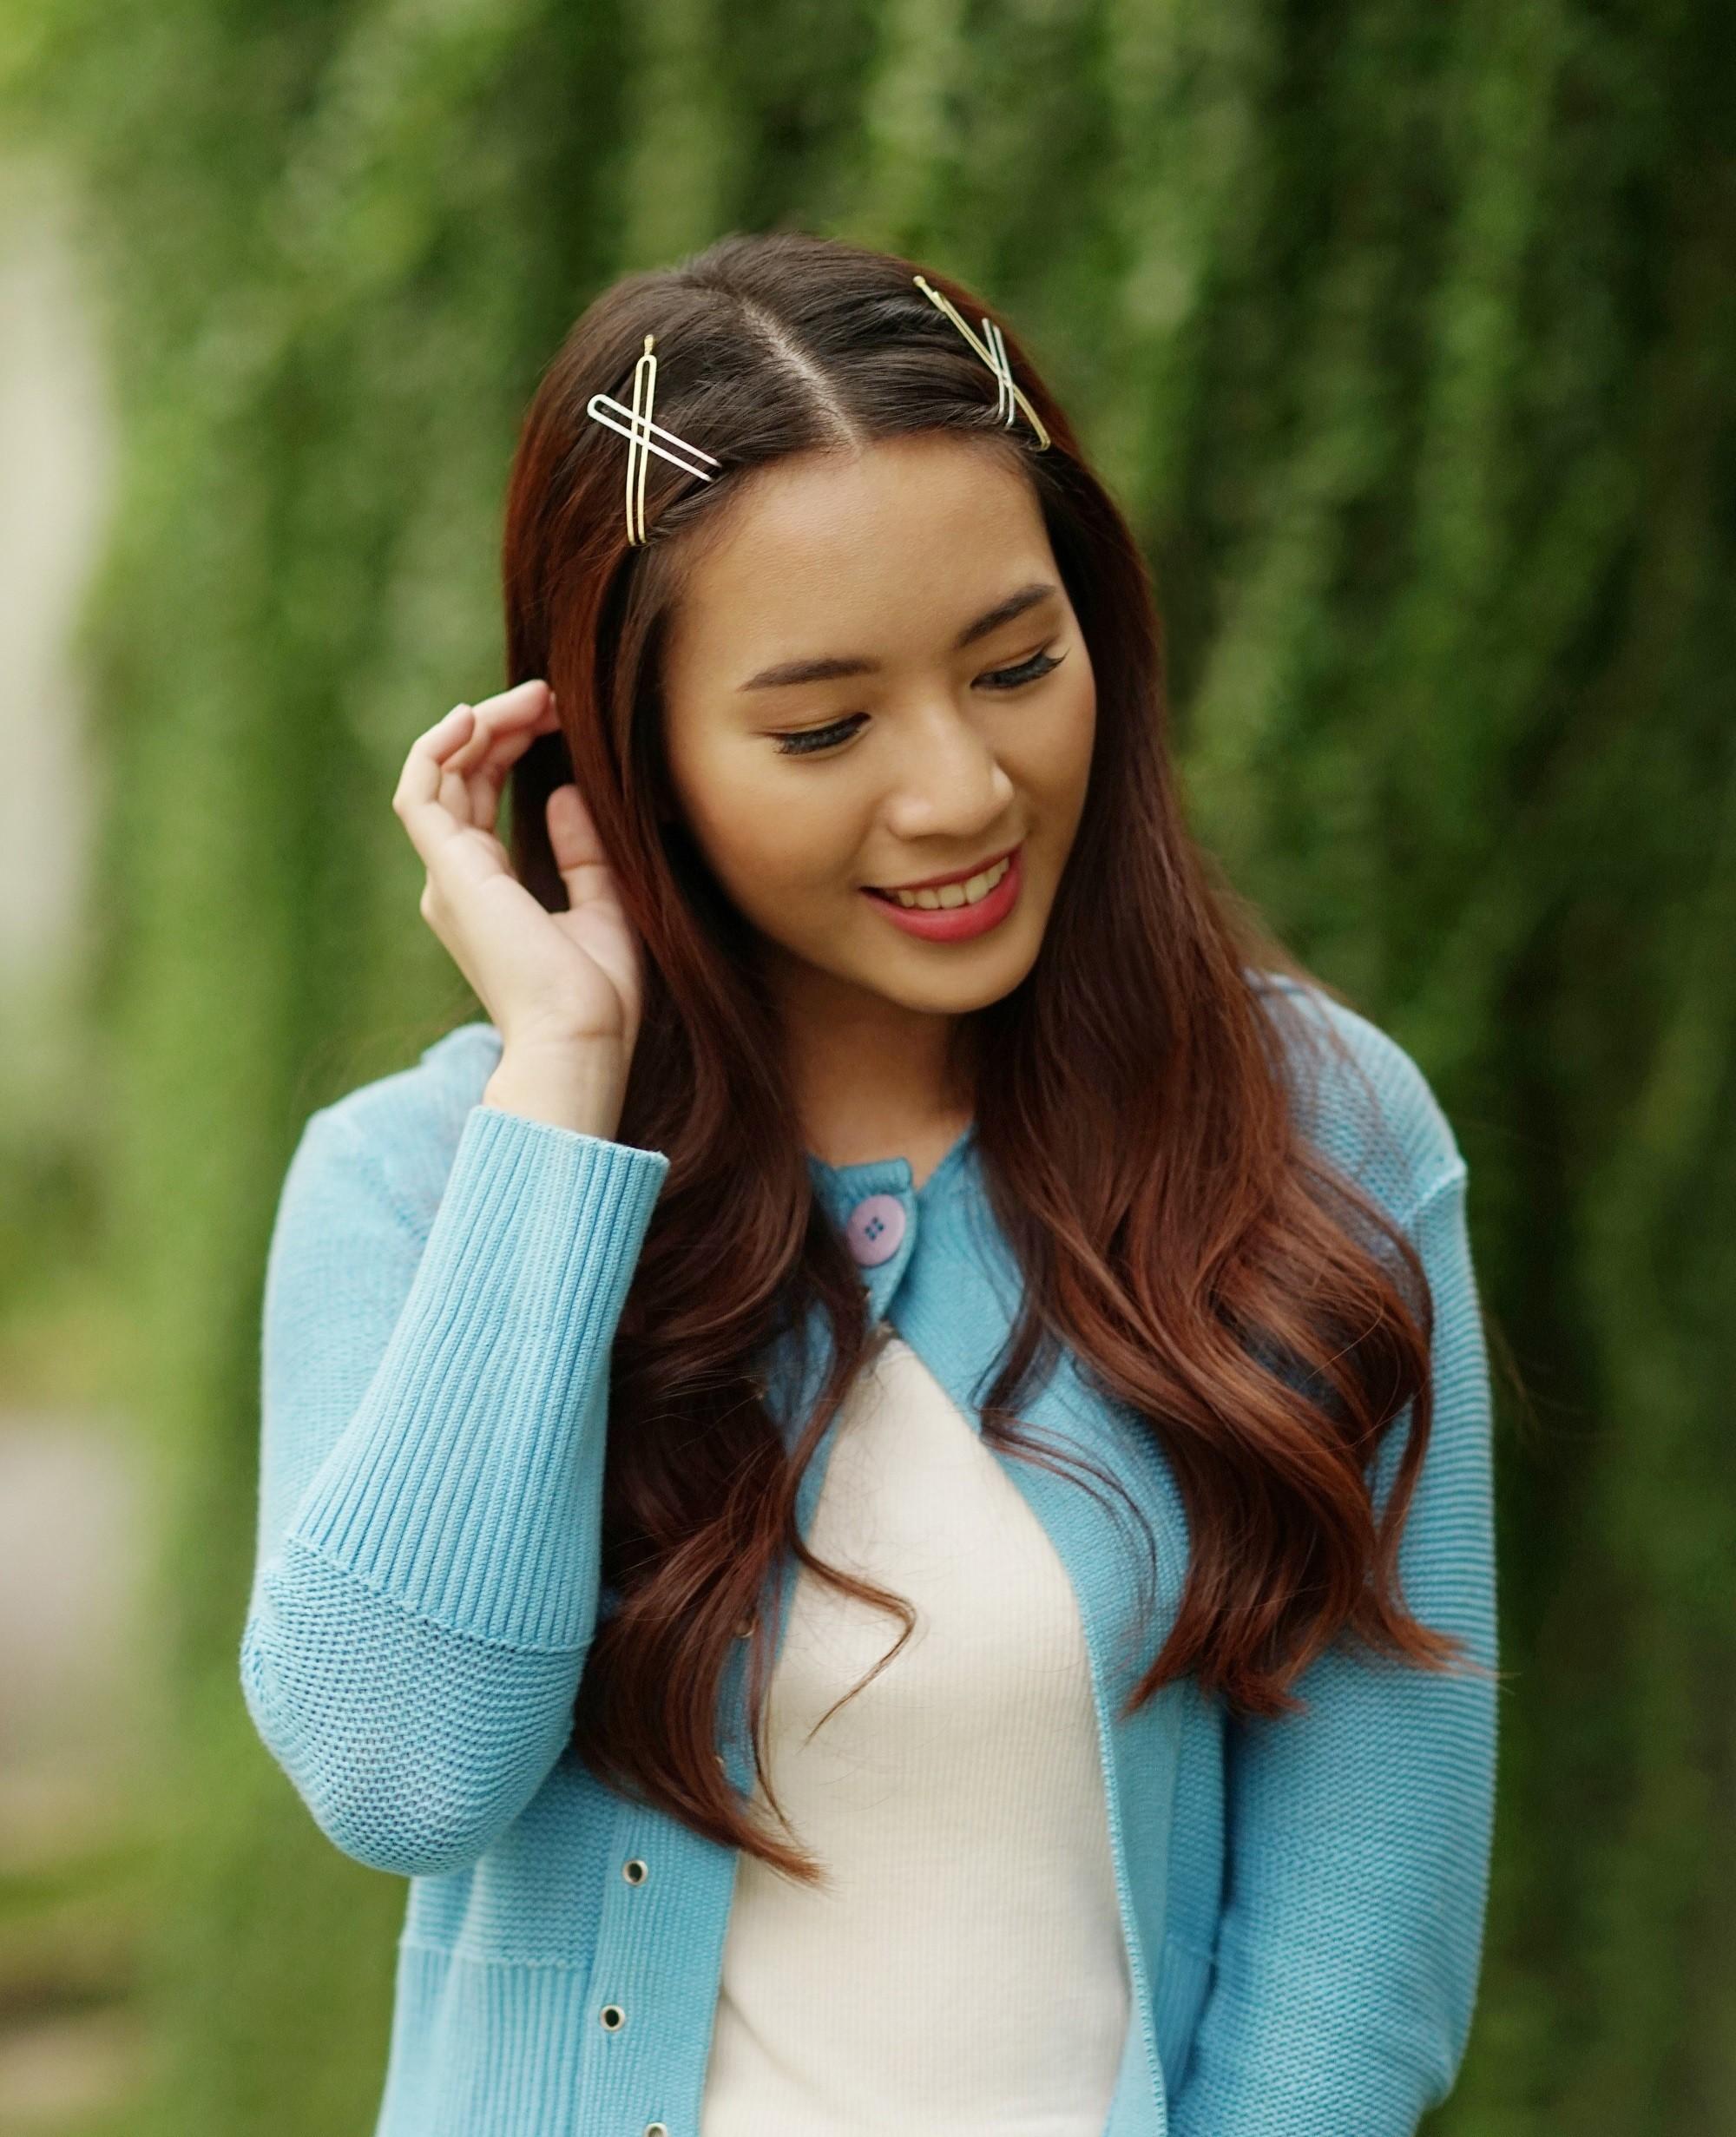 Marvelous Hair Clip Hairstyles Trendiest Looks To Try In 2020 All Things Natural Hairstyles Runnerswayorg